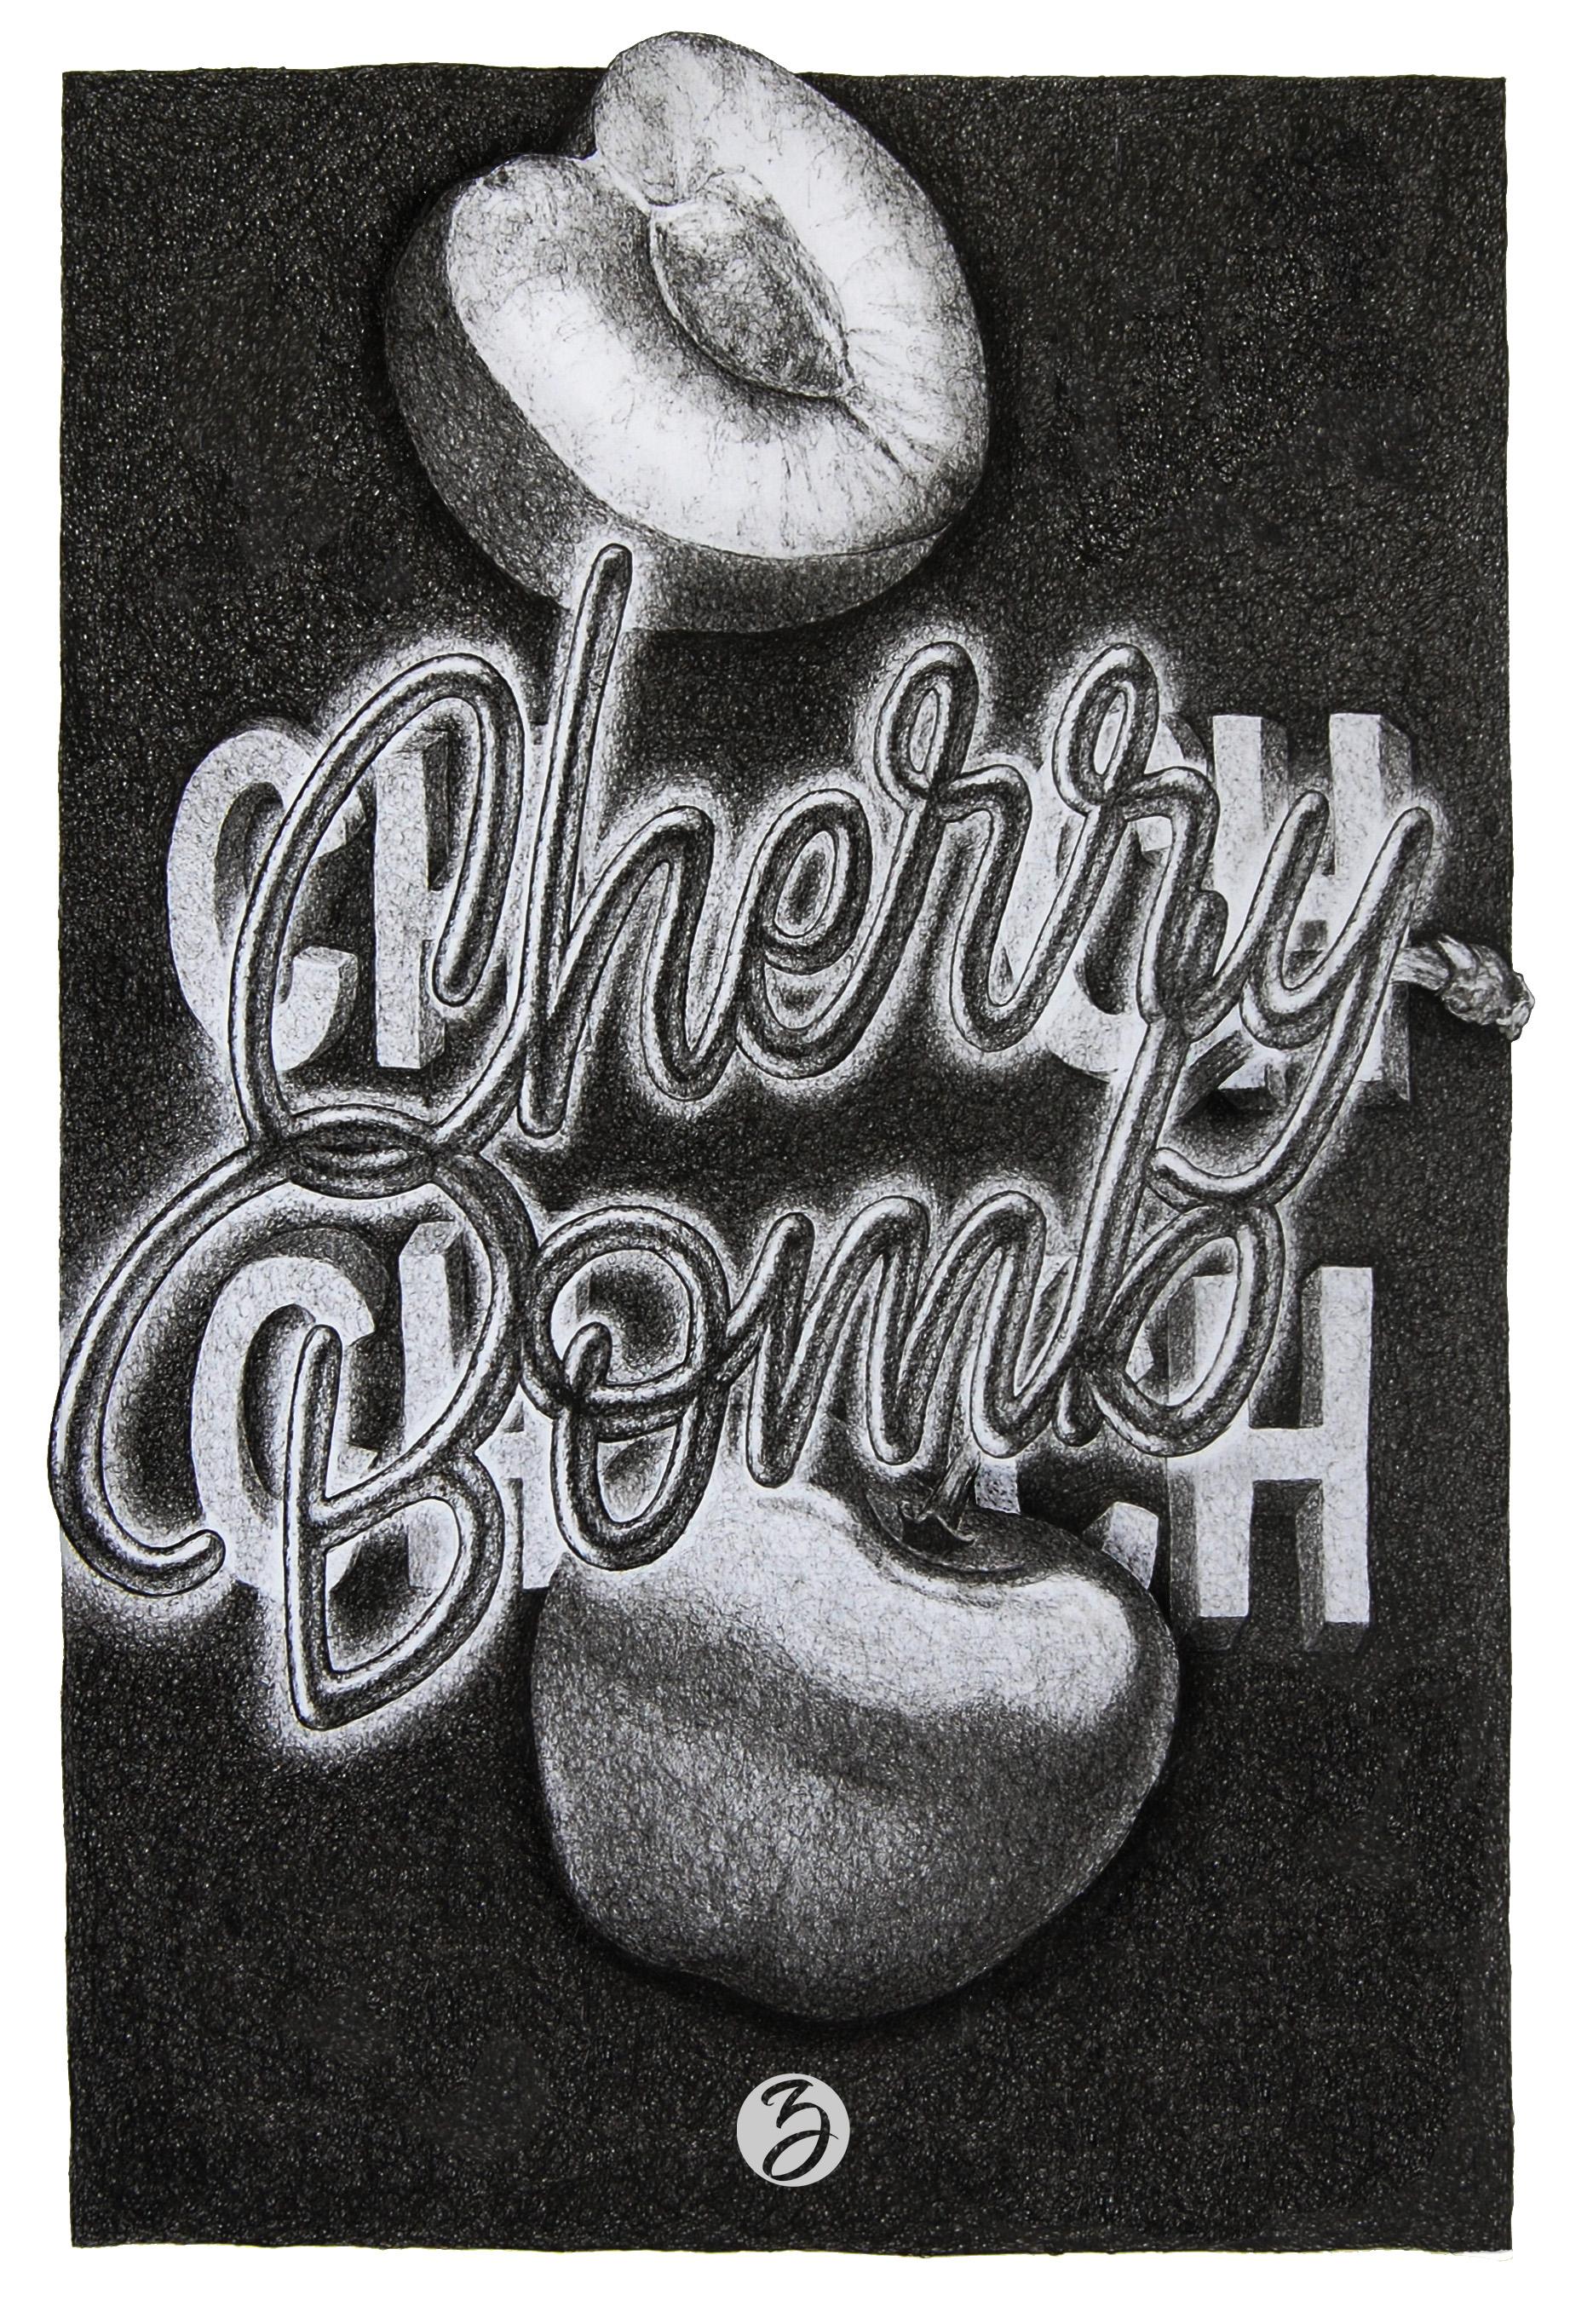 Cherry bomb II for printing copy.jpg